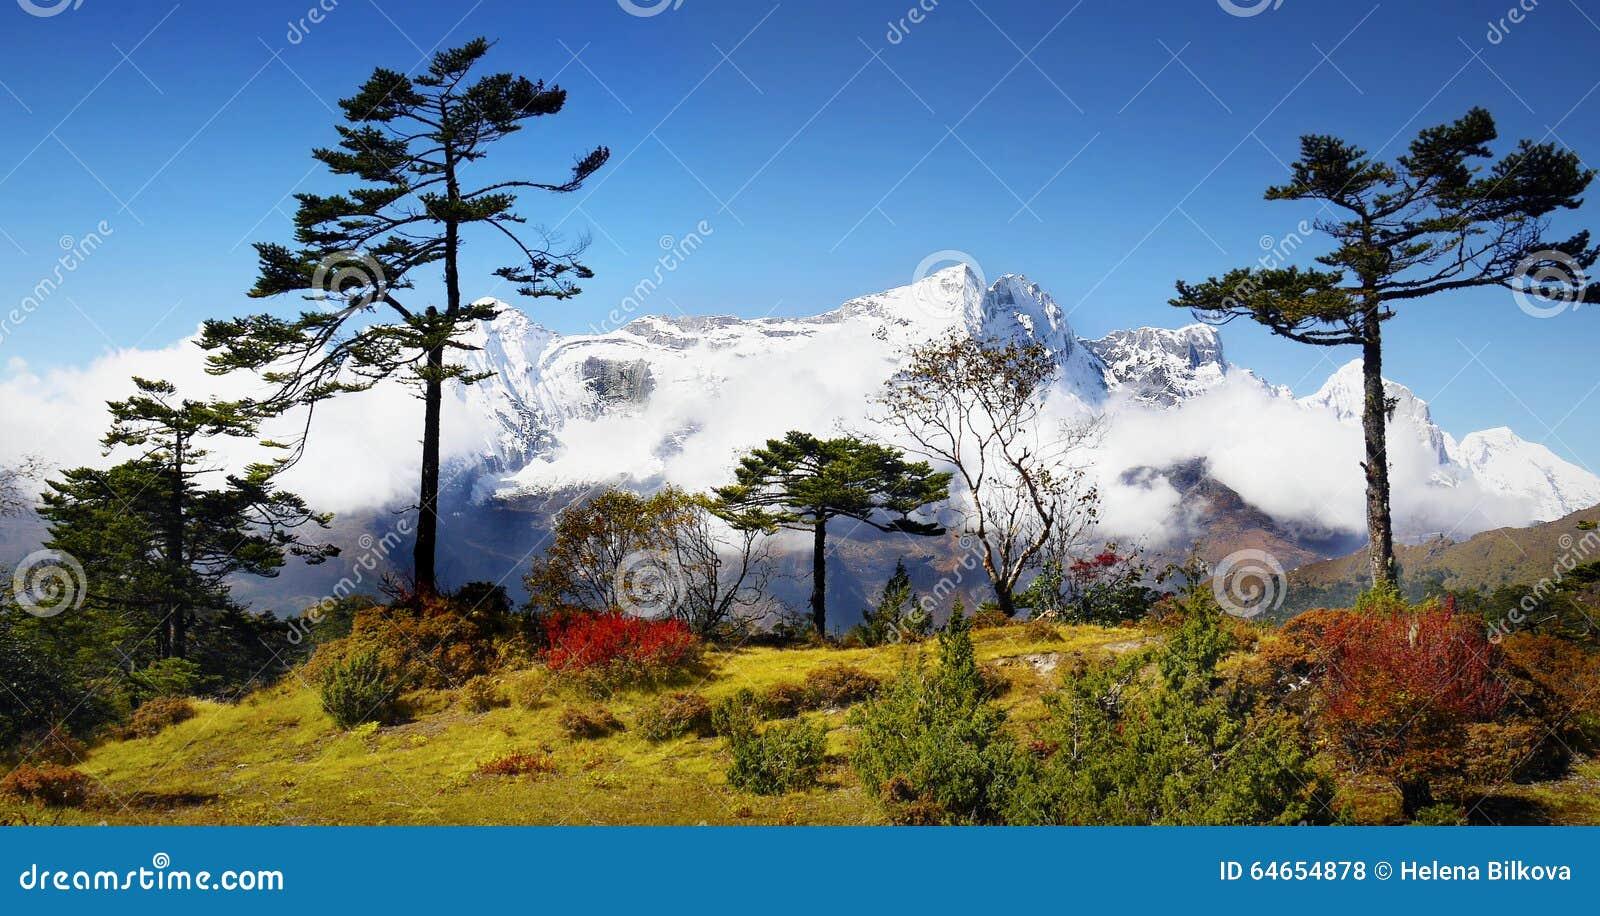 Mountains Scenic Landscape Autumn Himalayas